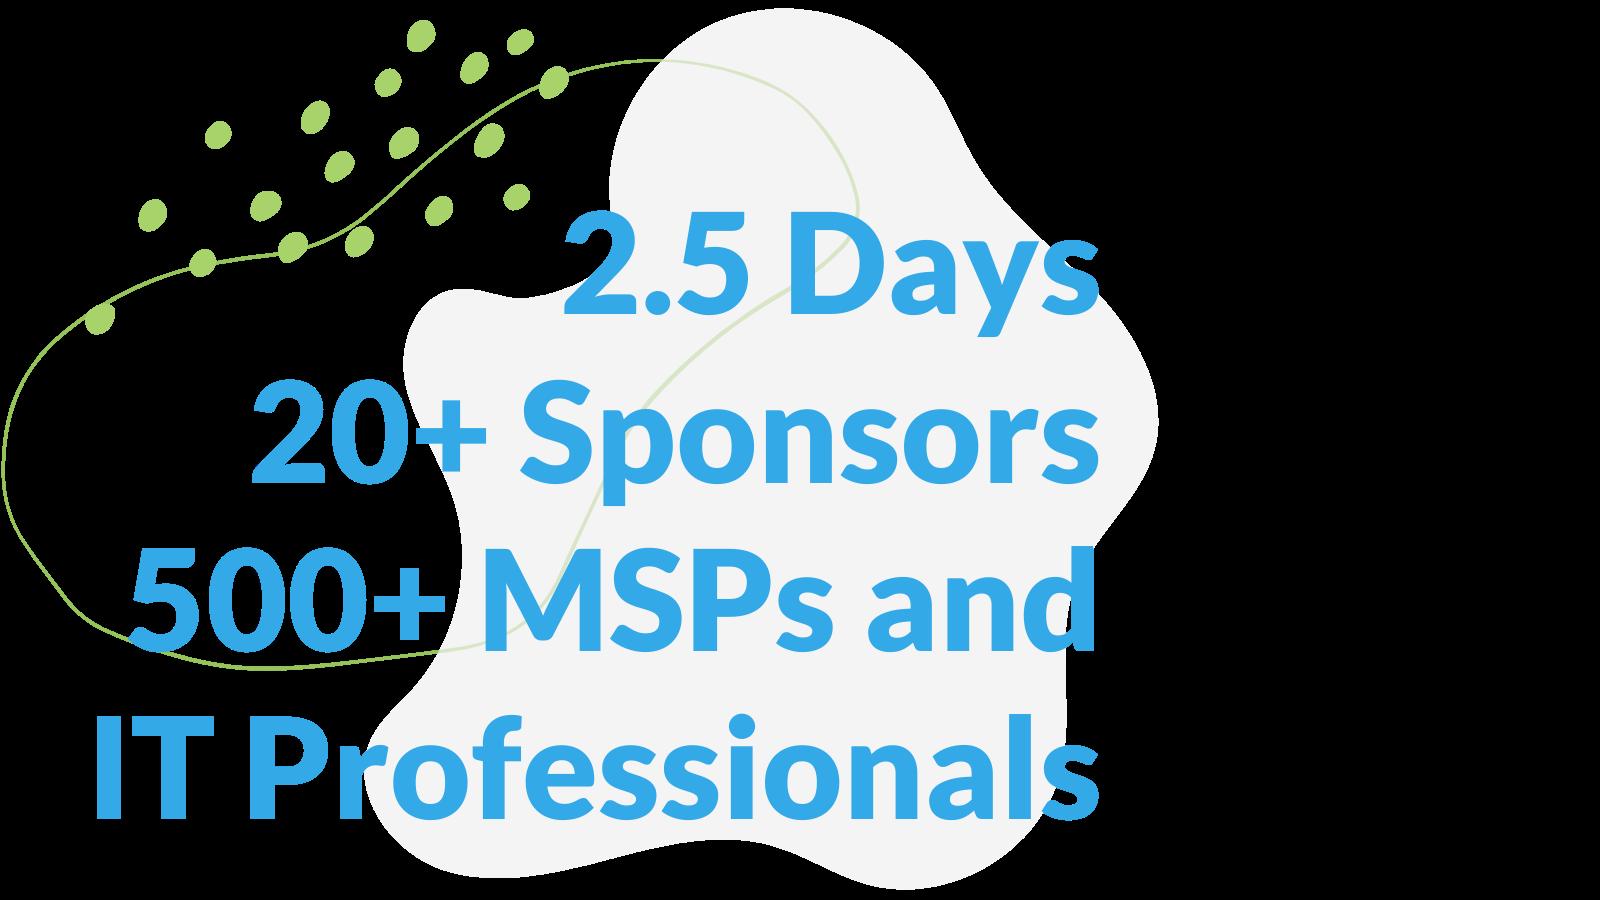 Days_Sponsors_MSPsIT